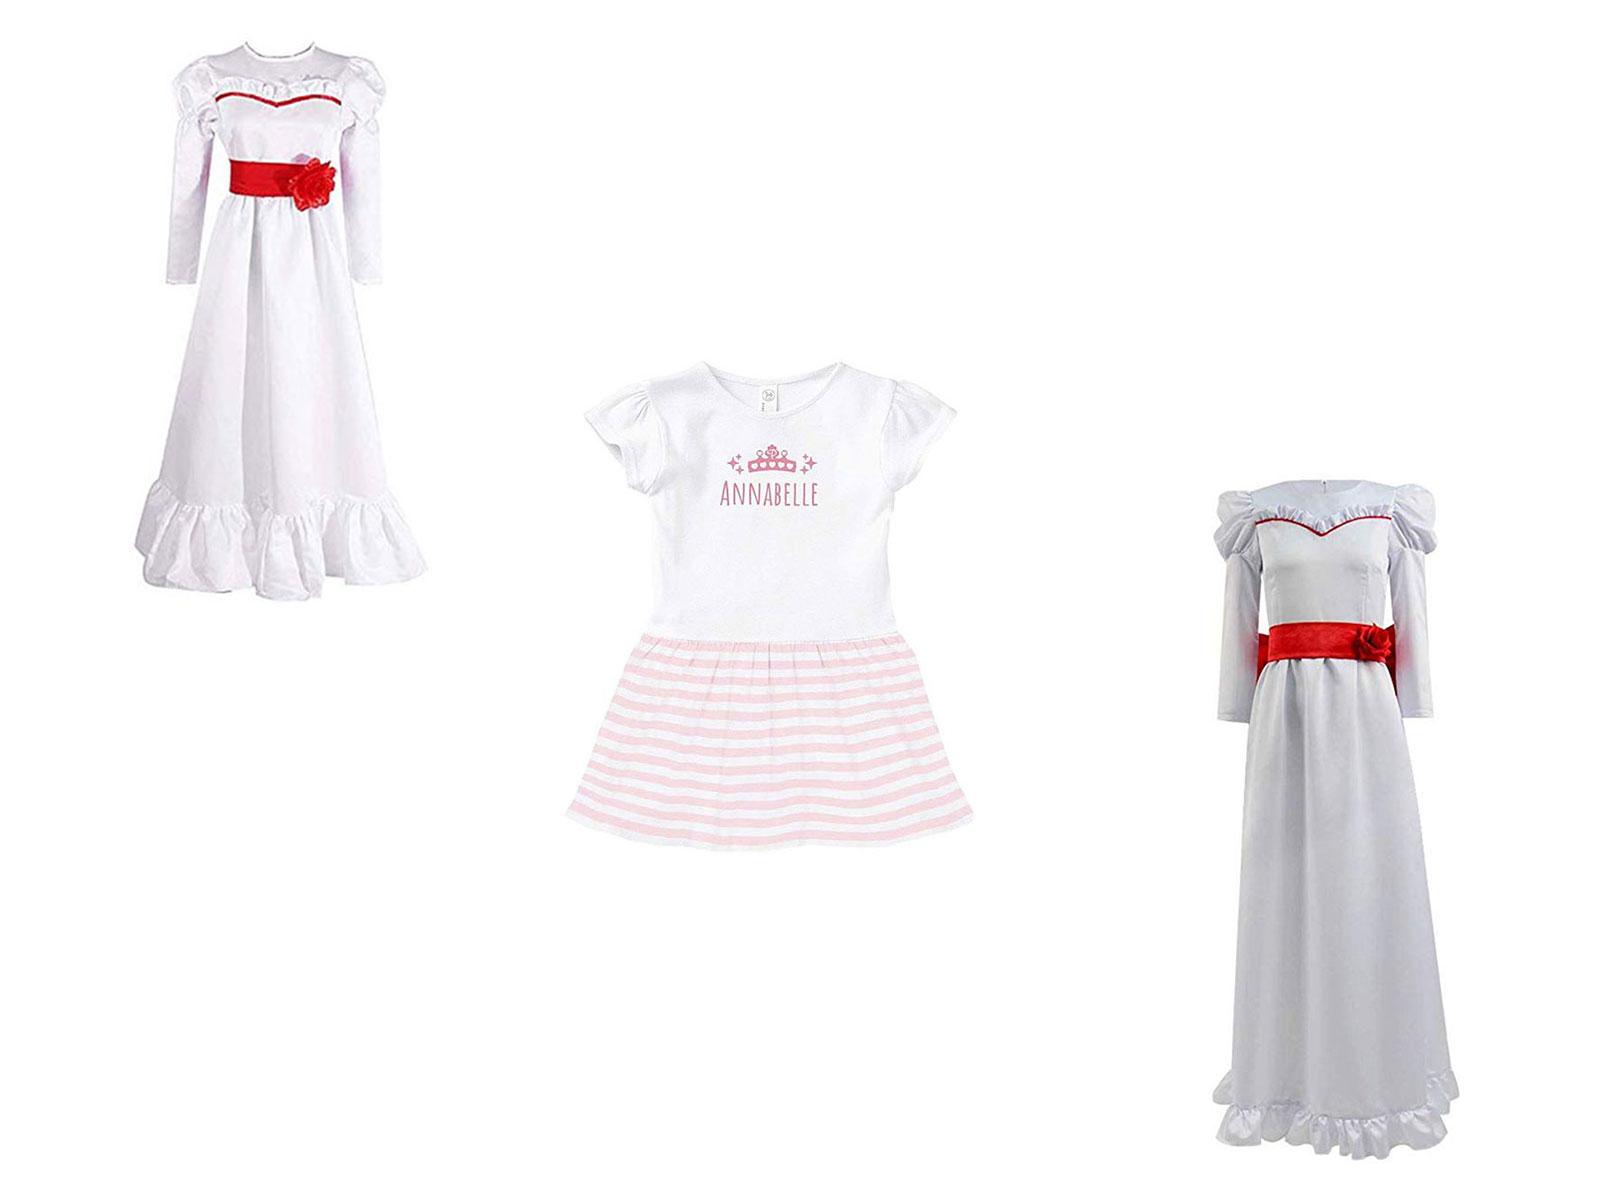 Annabelle-Full-Movie-Costume-Ideas-For-Halloween-2019-F